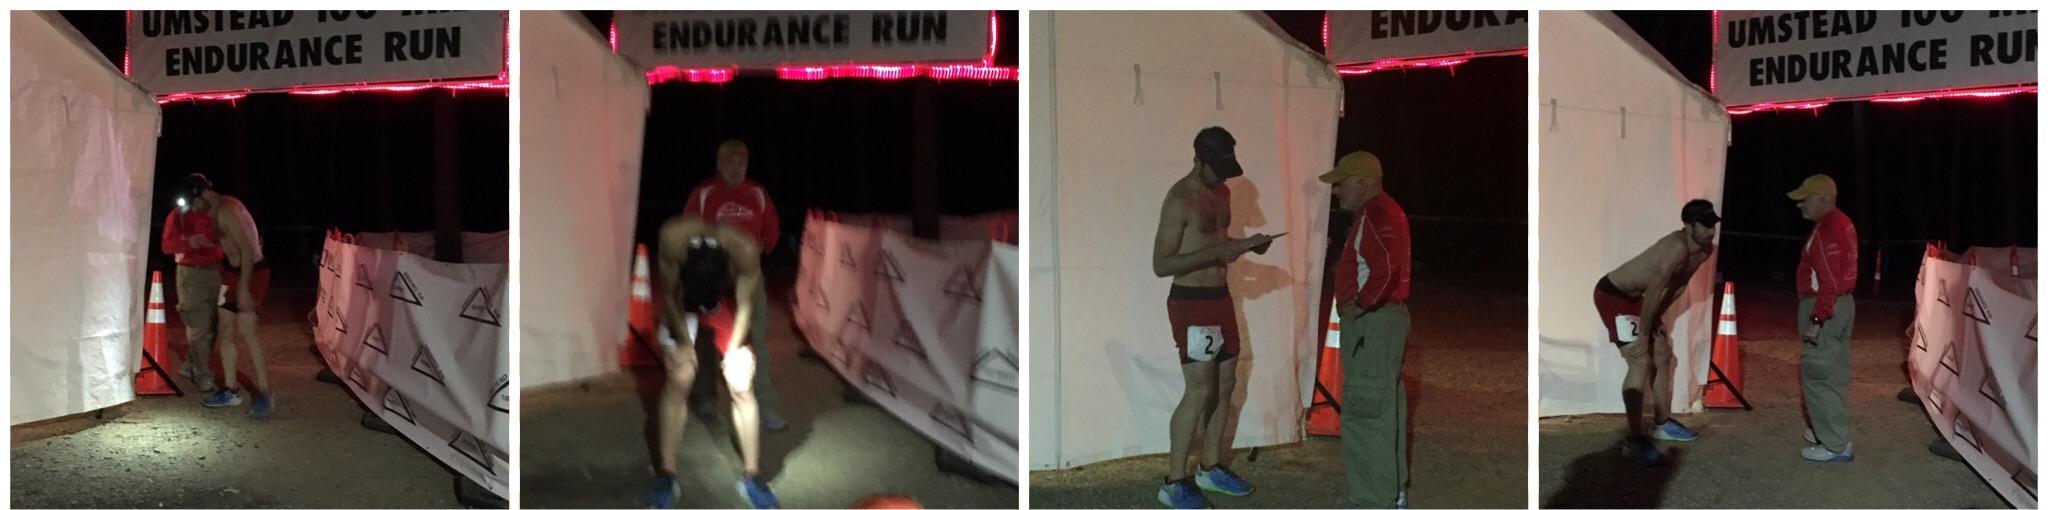 finish line pic